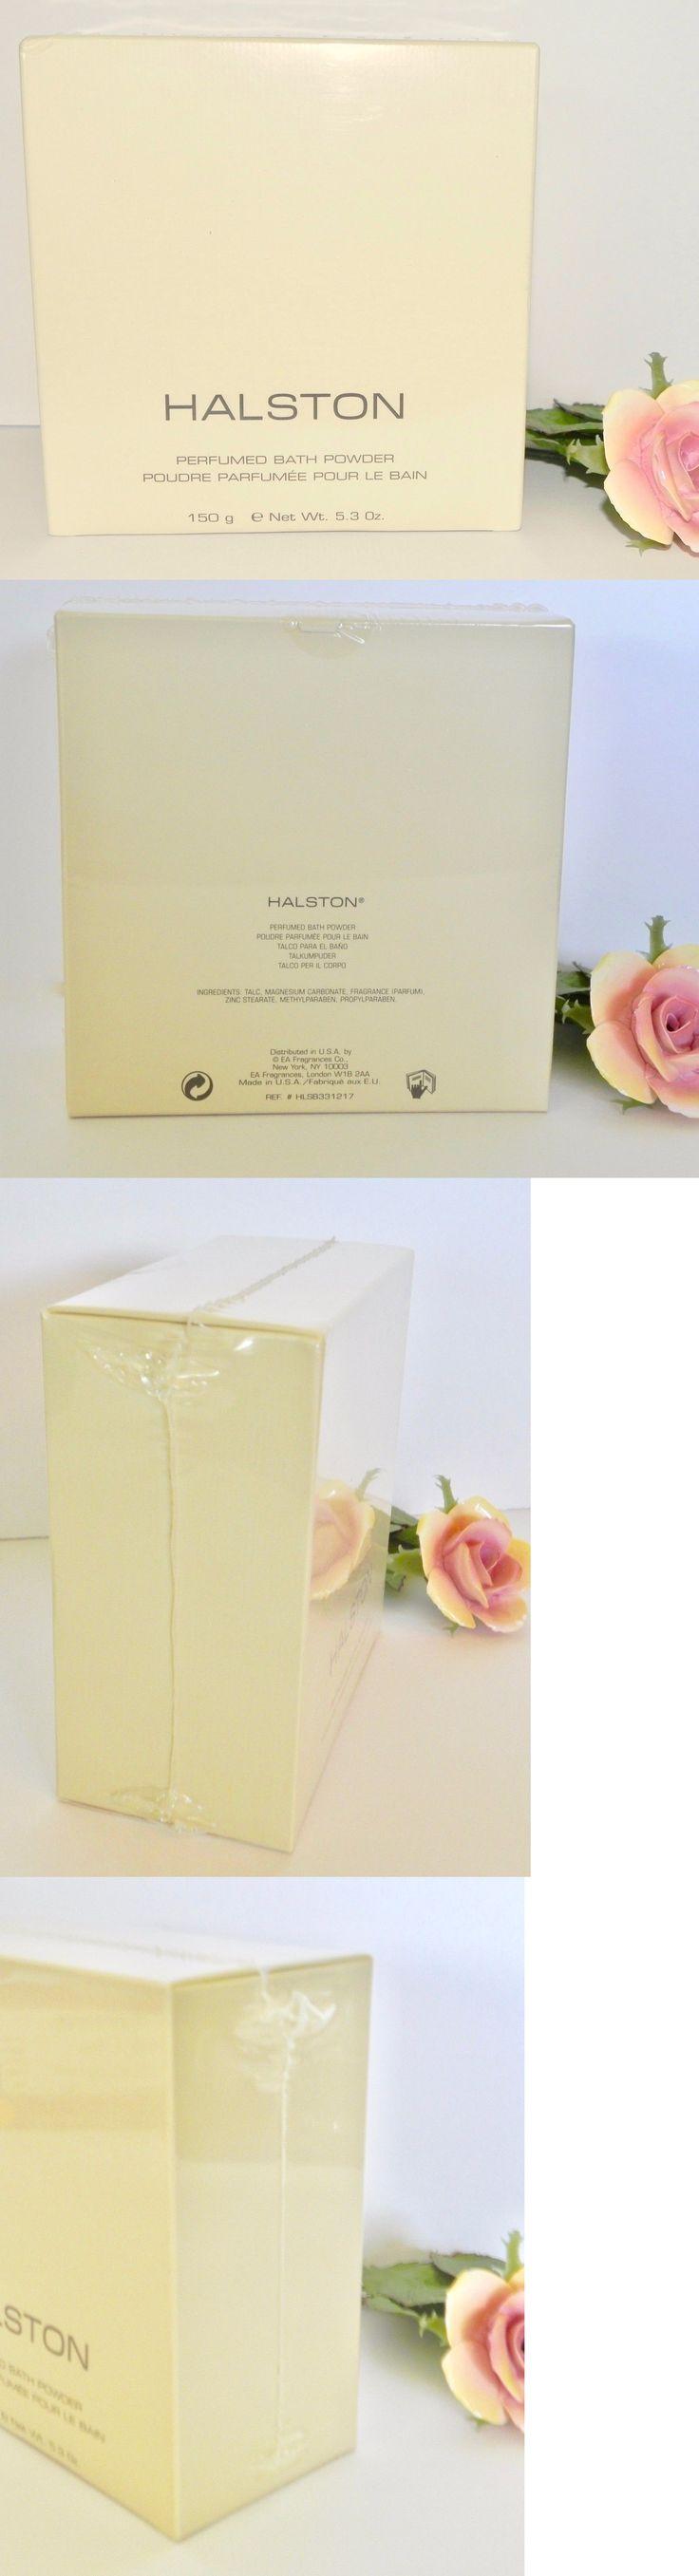 Body Powders: Sealed Vtg Original Halston Perfumed Bath Body Dusting Powder 150G Perfume Nos -> BUY IT NOW ONLY: $125 on eBay!